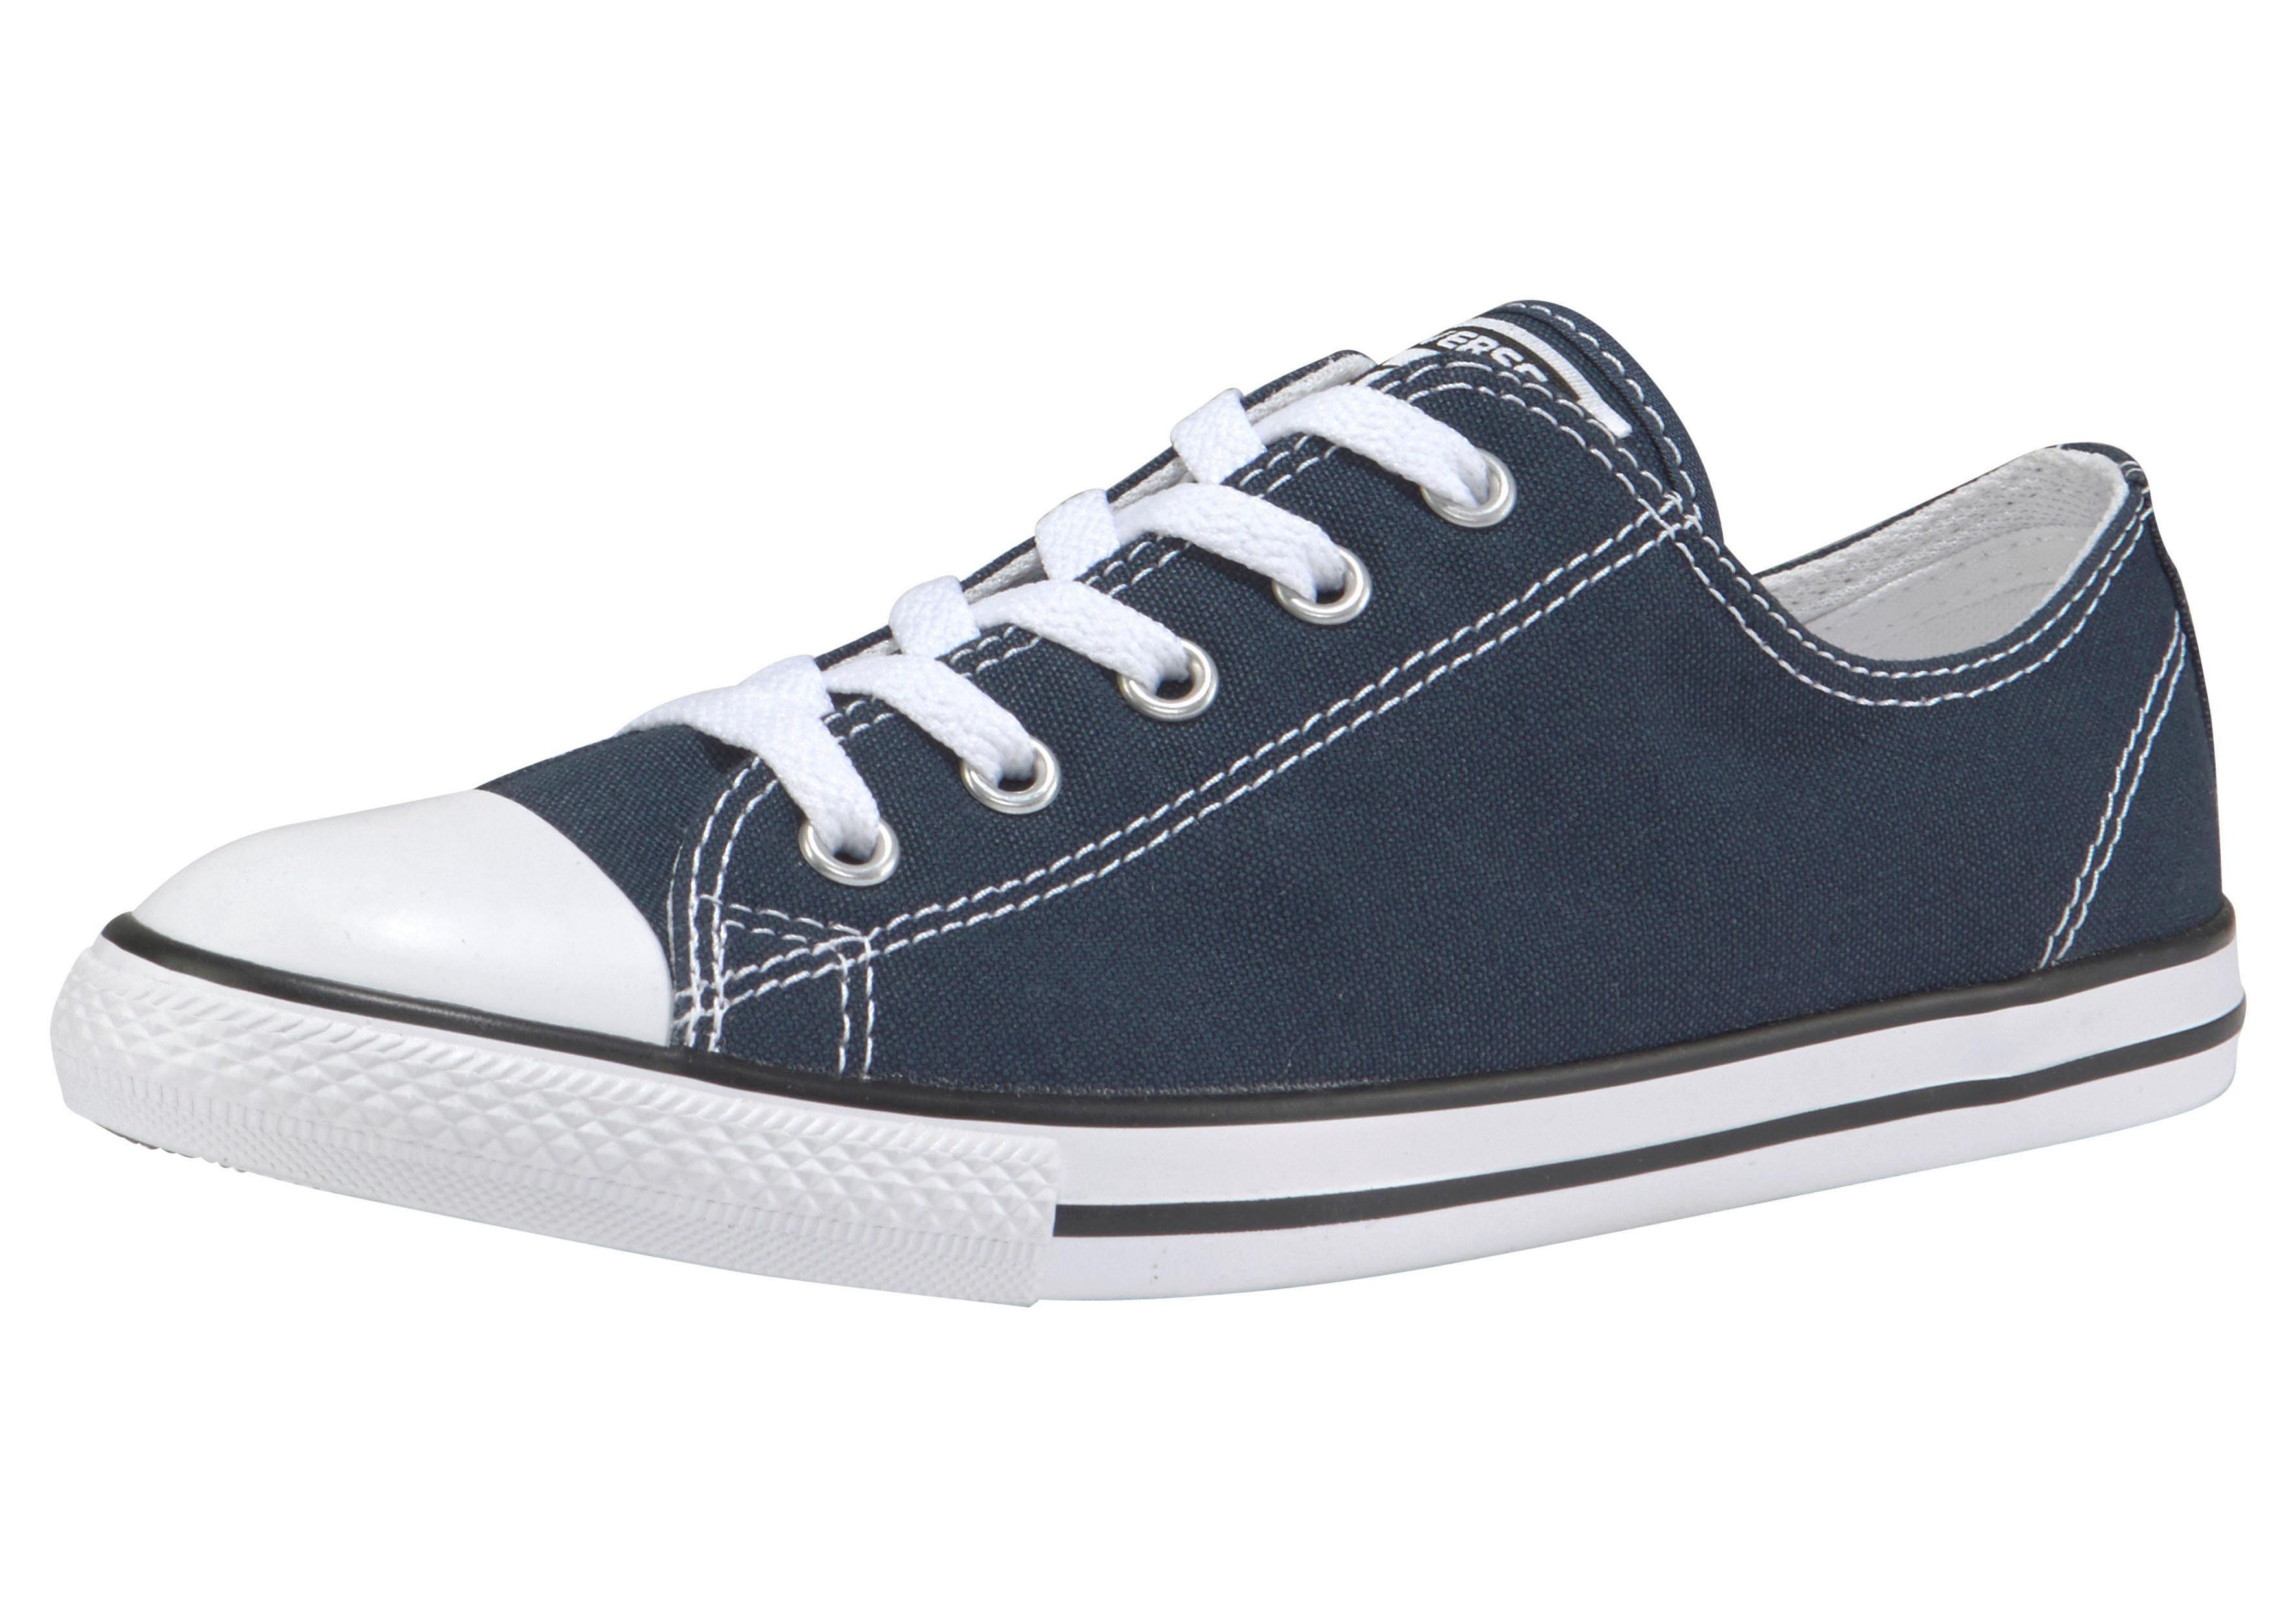 CONVERSE, Chuck Taylor Dainty Ox Sneakers Low, grau Gr.42